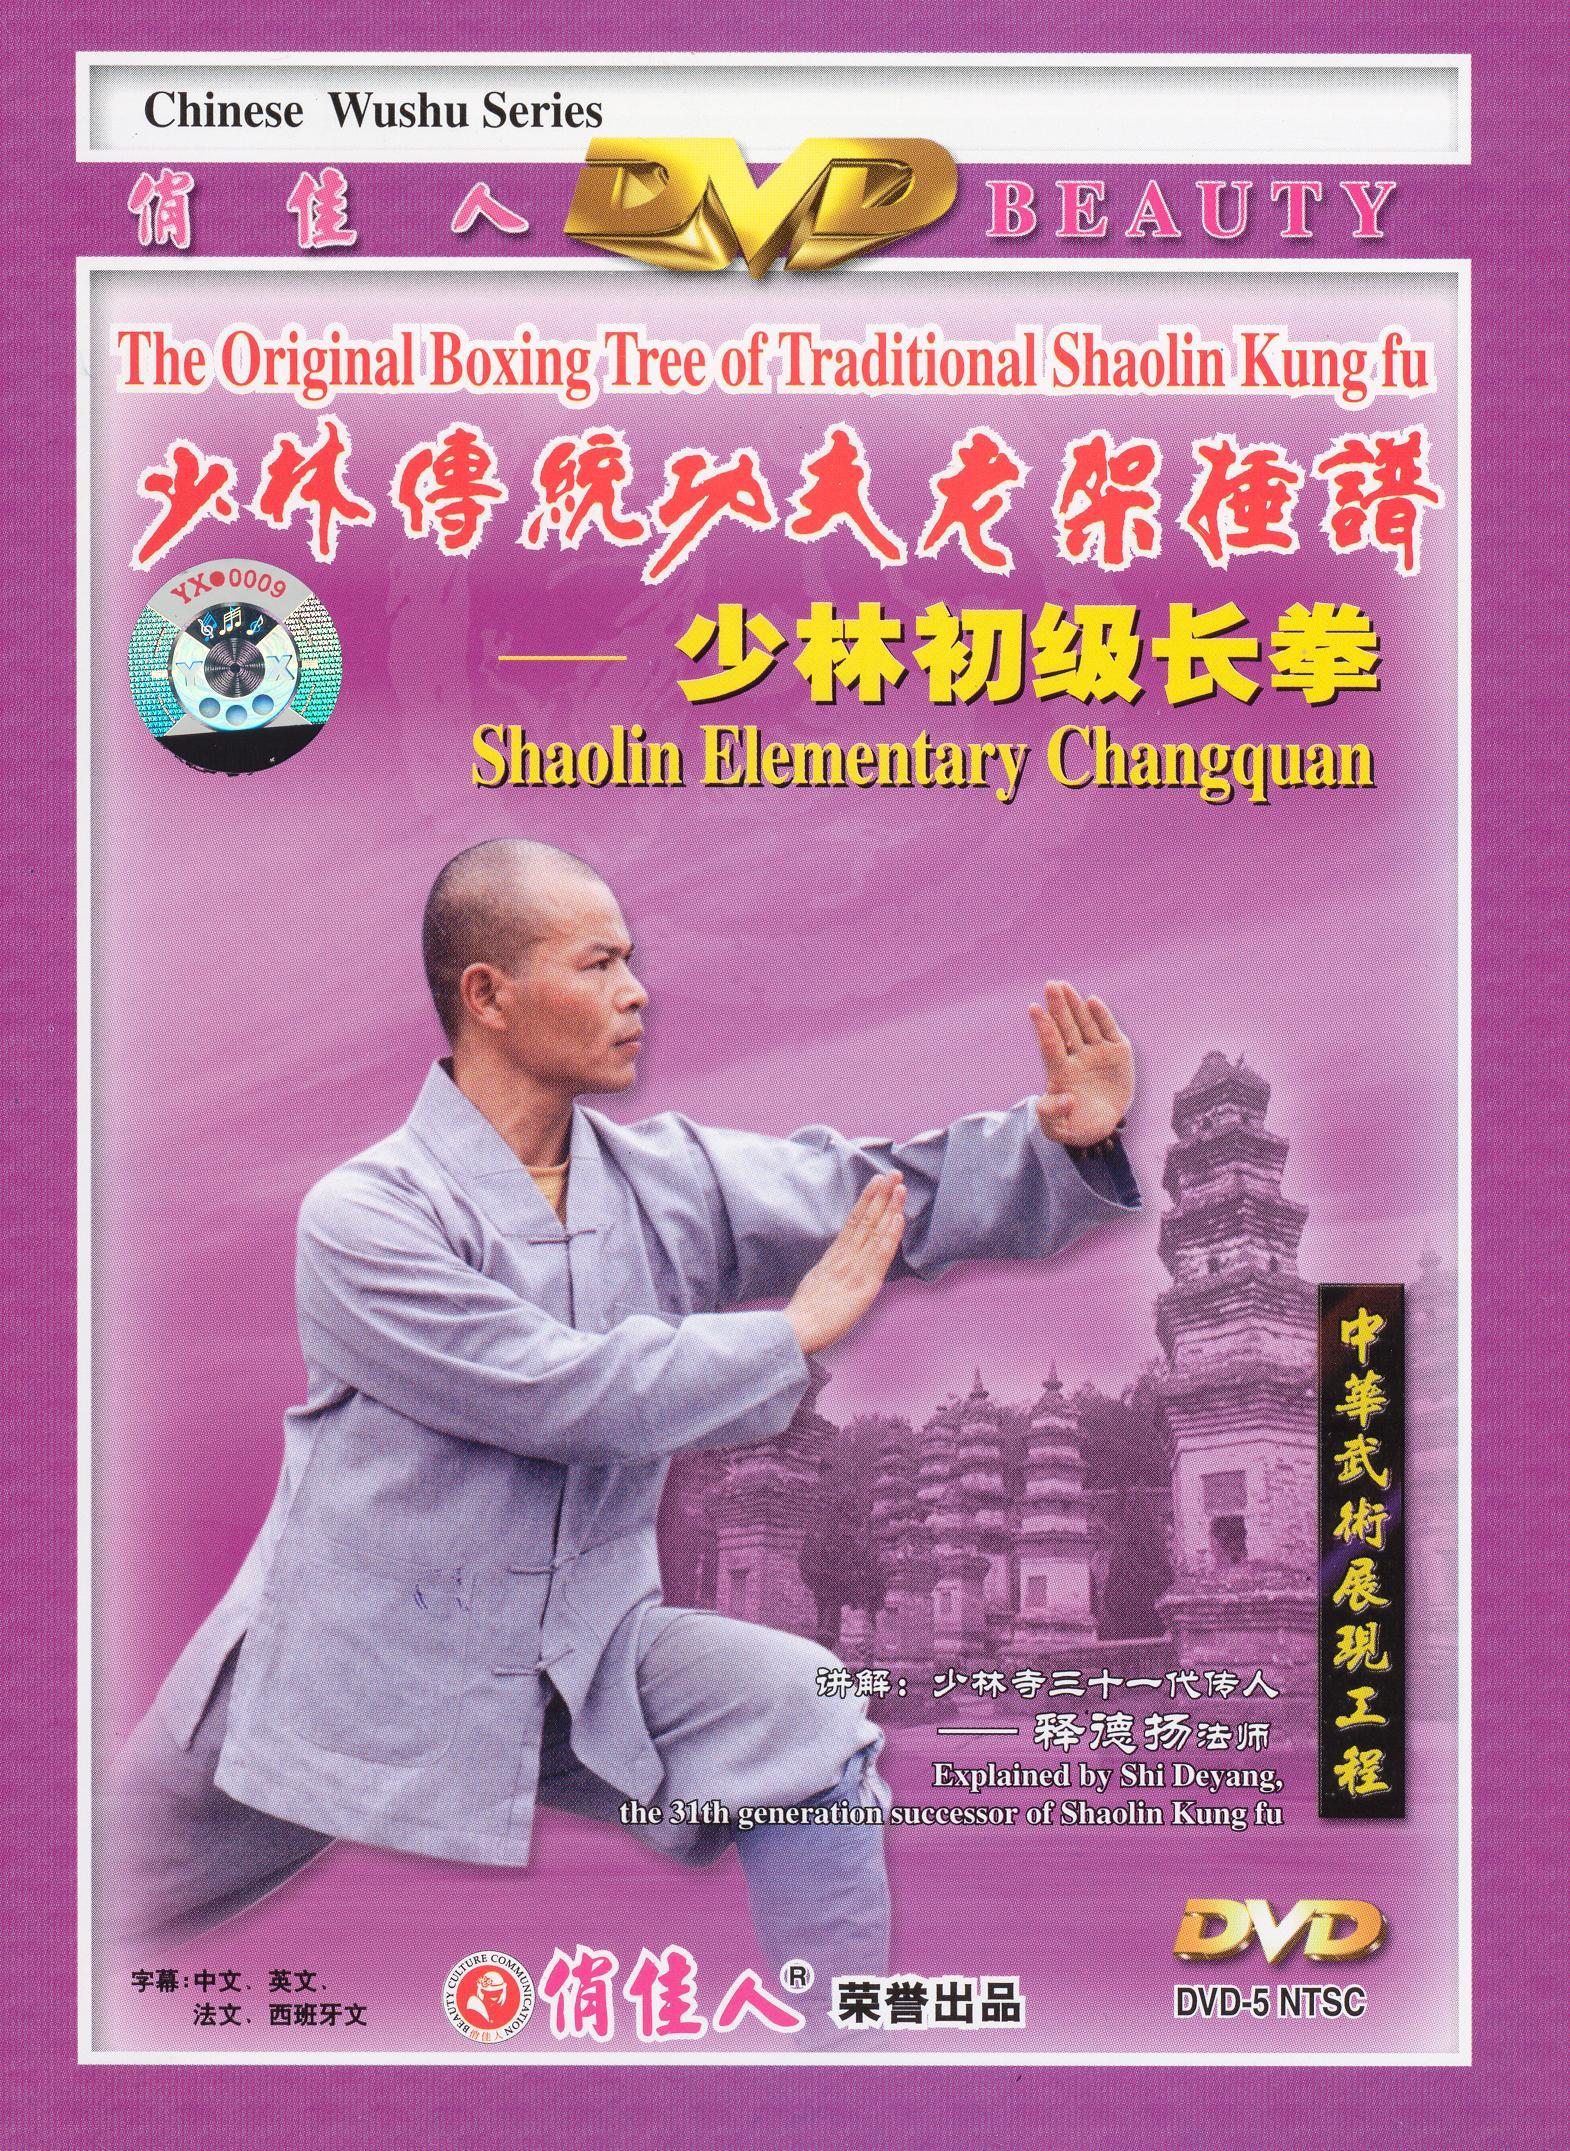 Shaolin Elementary Changquan, Vol. 2